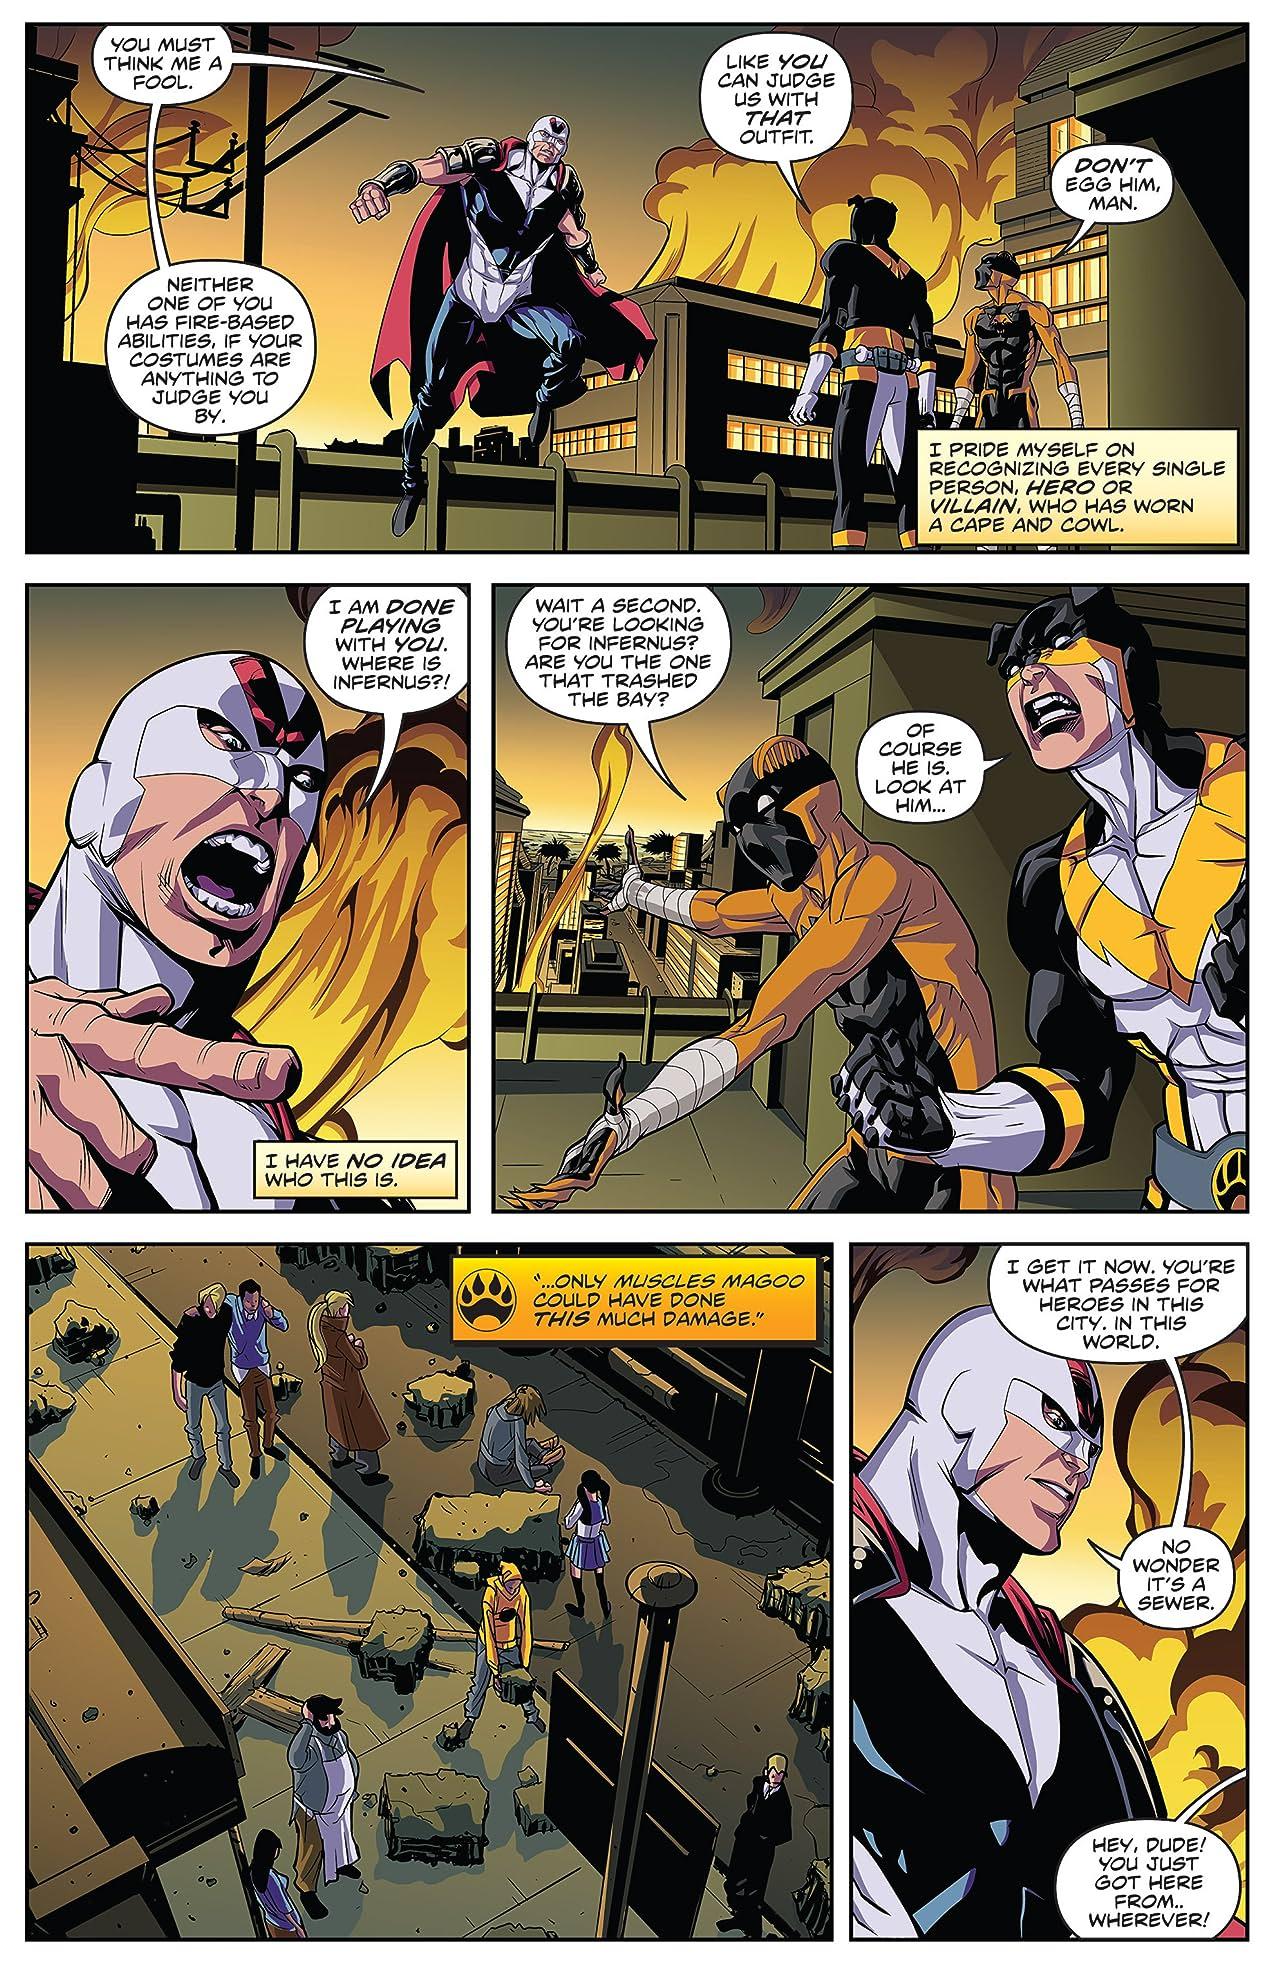 Actionverse #4